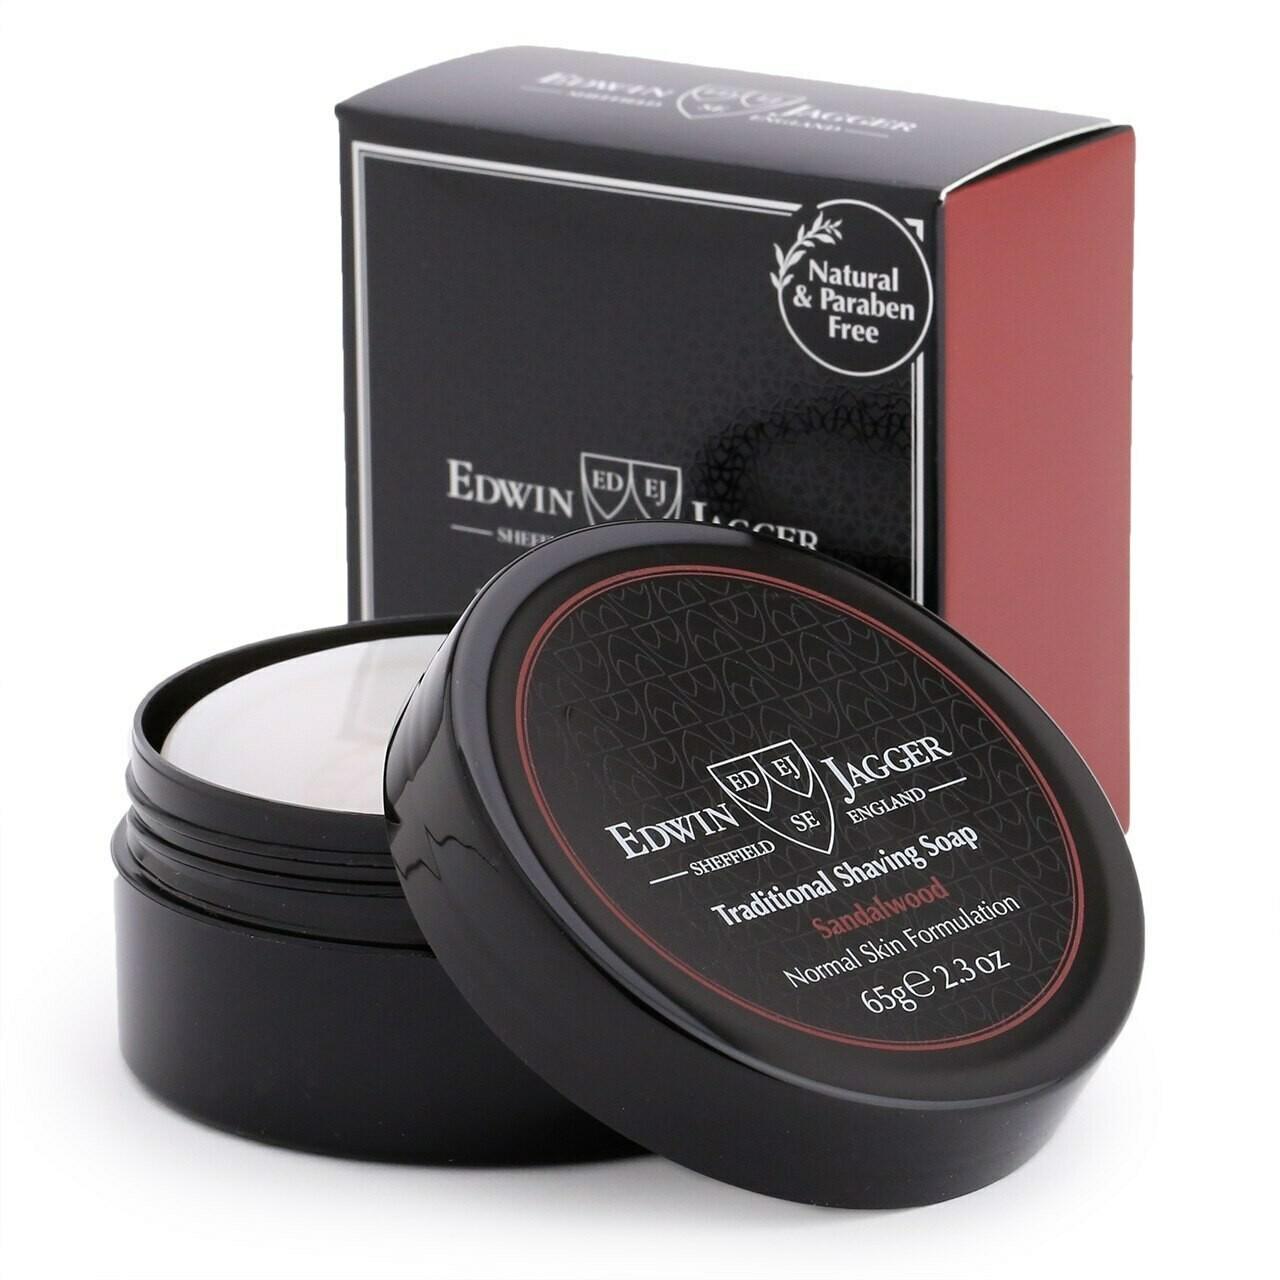 Edwin Jagger Sandalwood (Travel Container) - Мыло для бритья, 65 гр